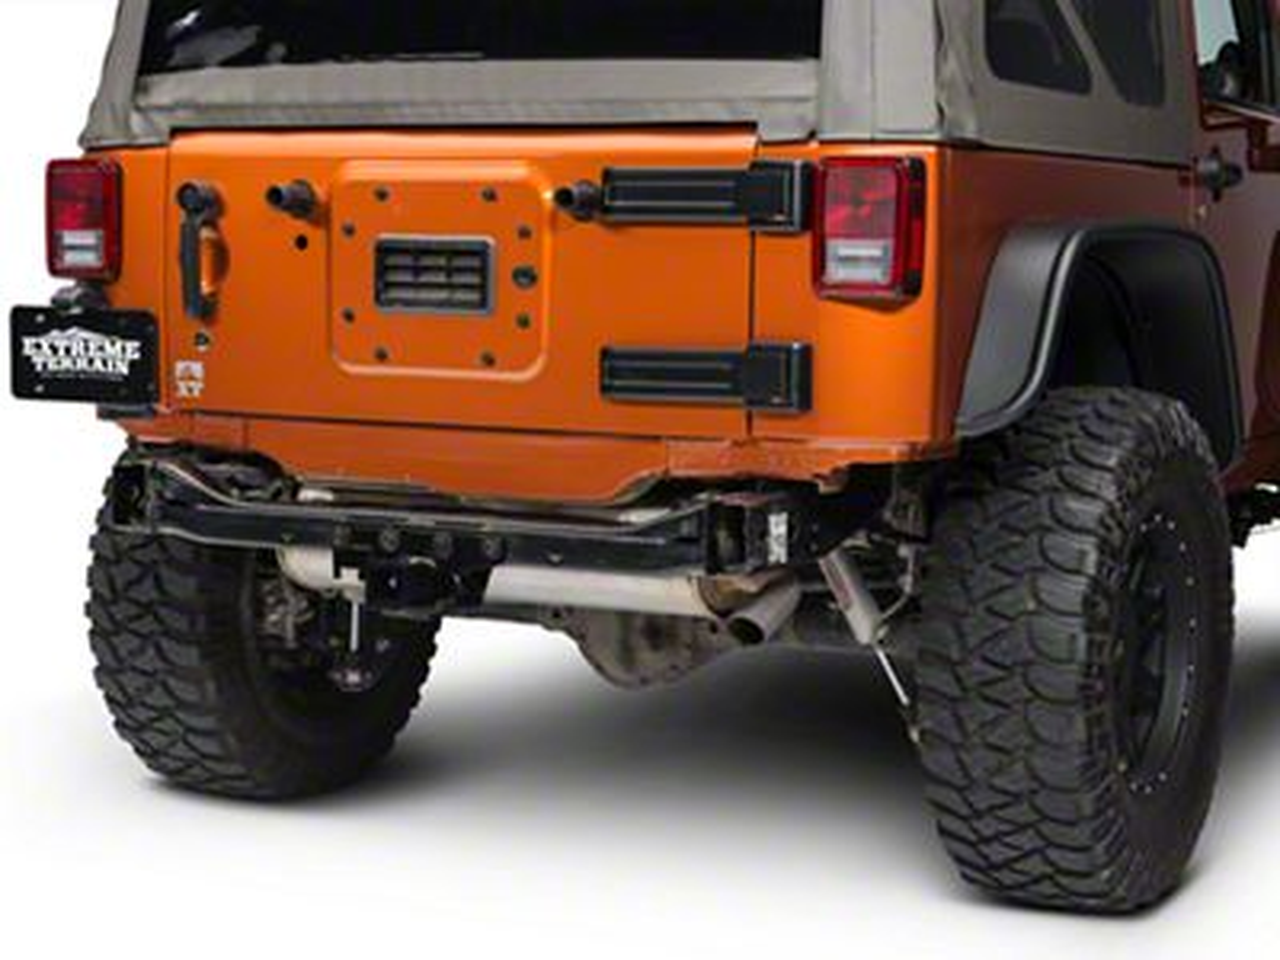 Jeep Wrangler Jk Trailer Wiring Diagram